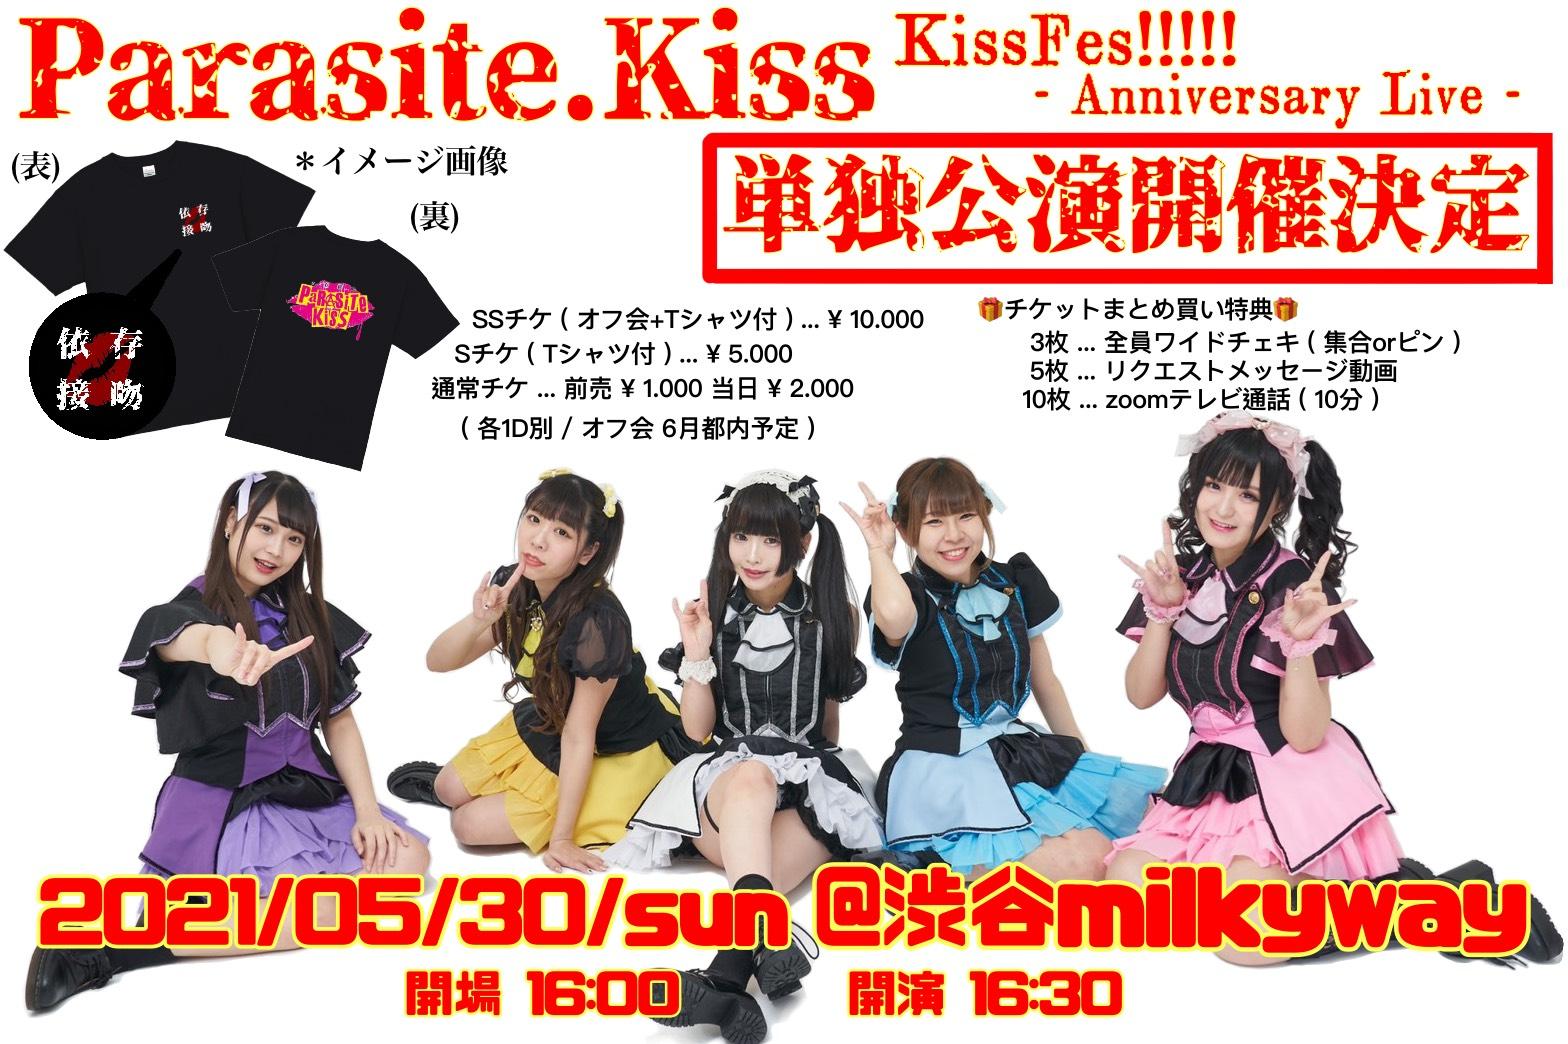 KissFes!!!!! -Anniversary LIVE-